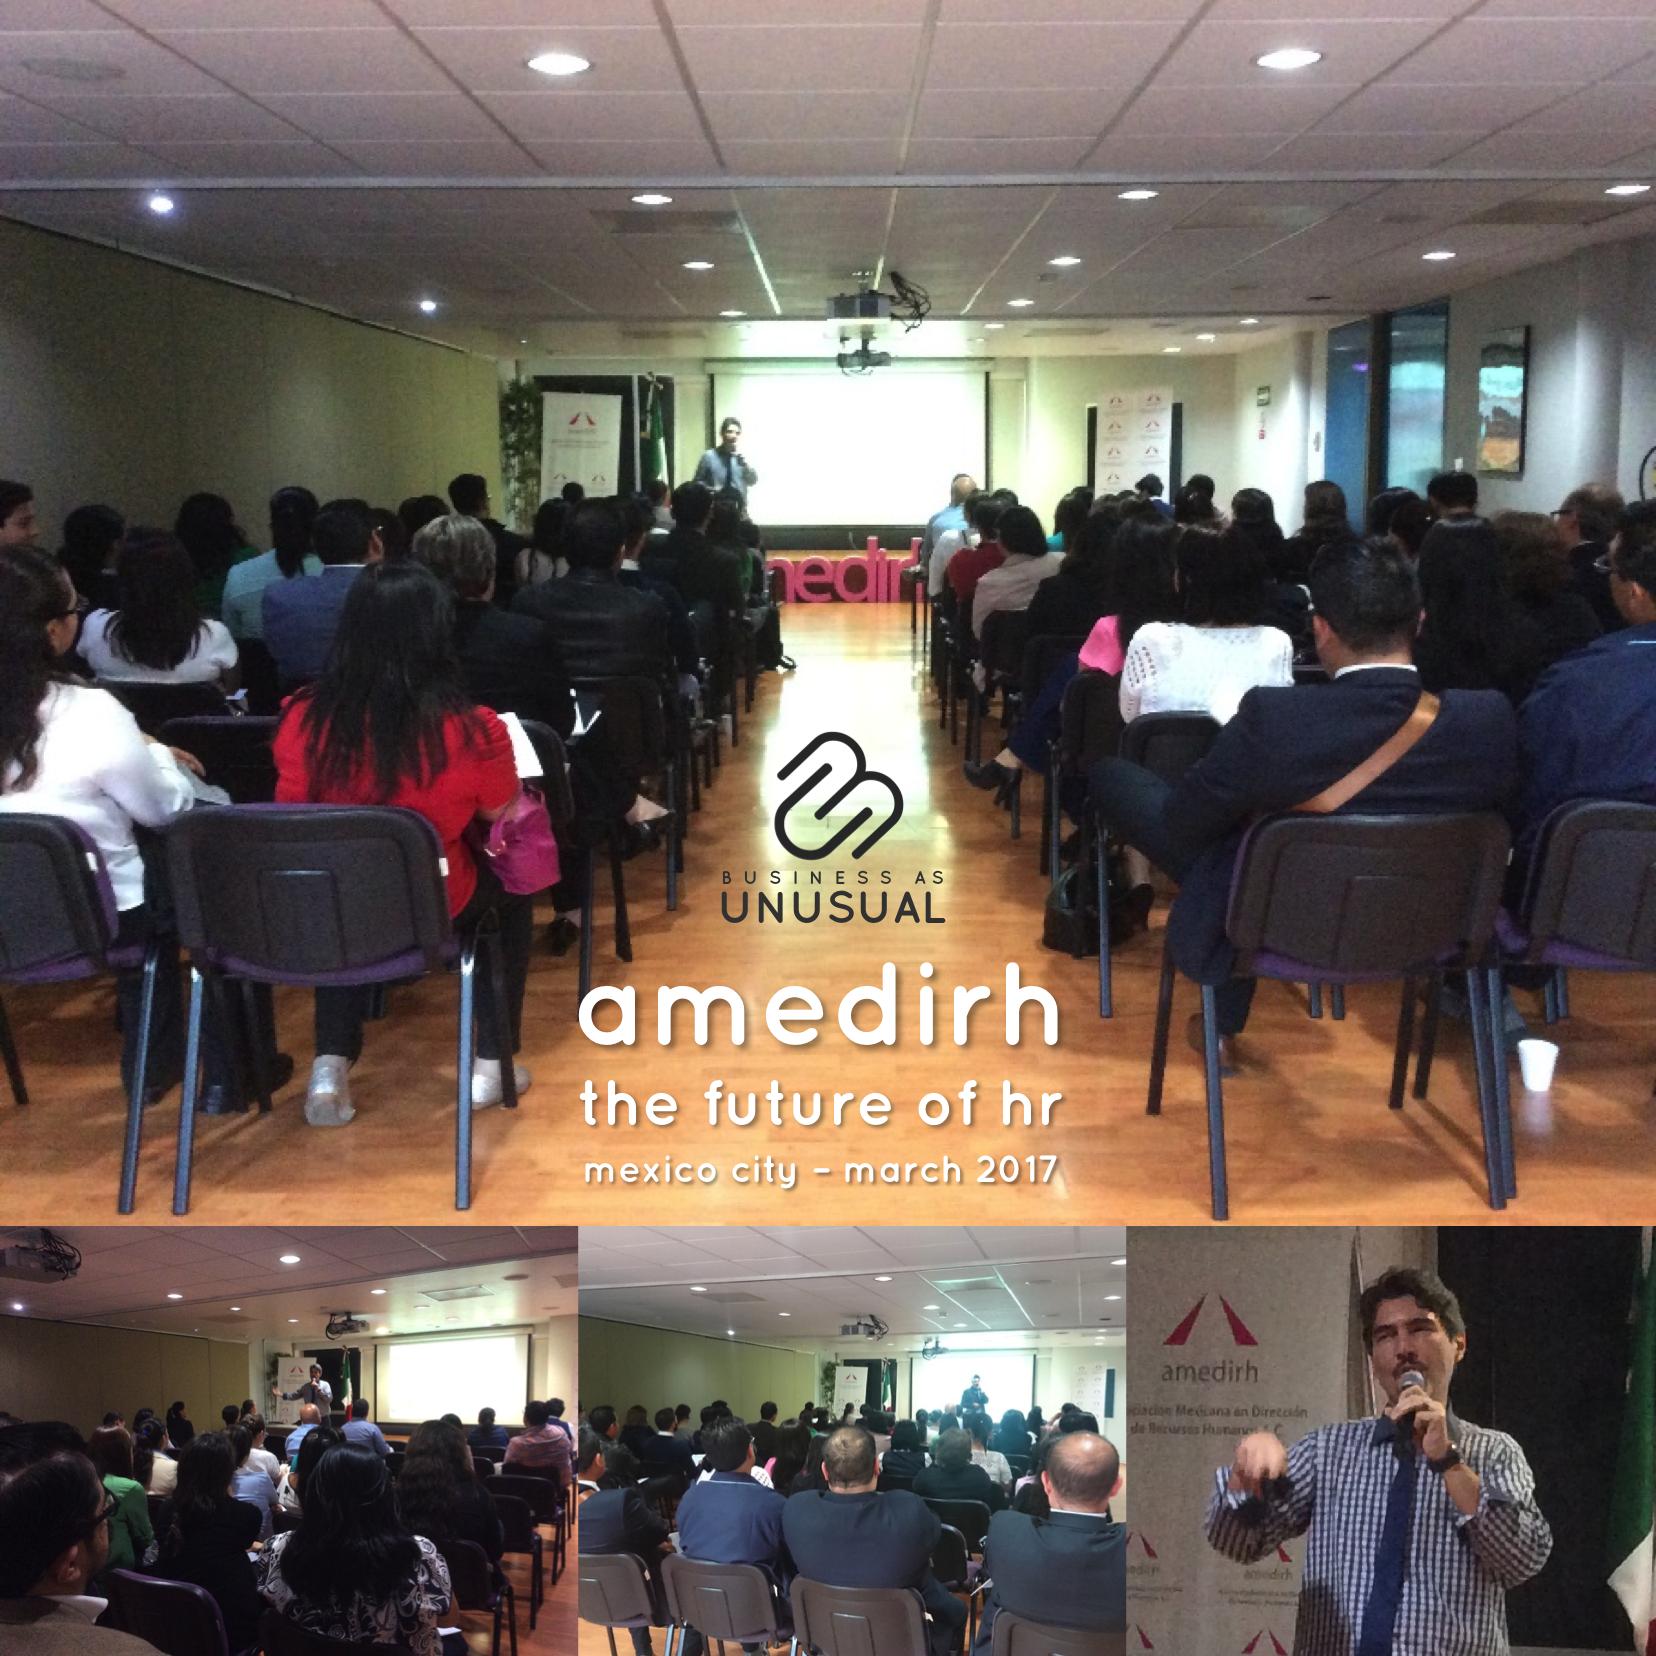 AMEDIRH - The Future of Human Resources